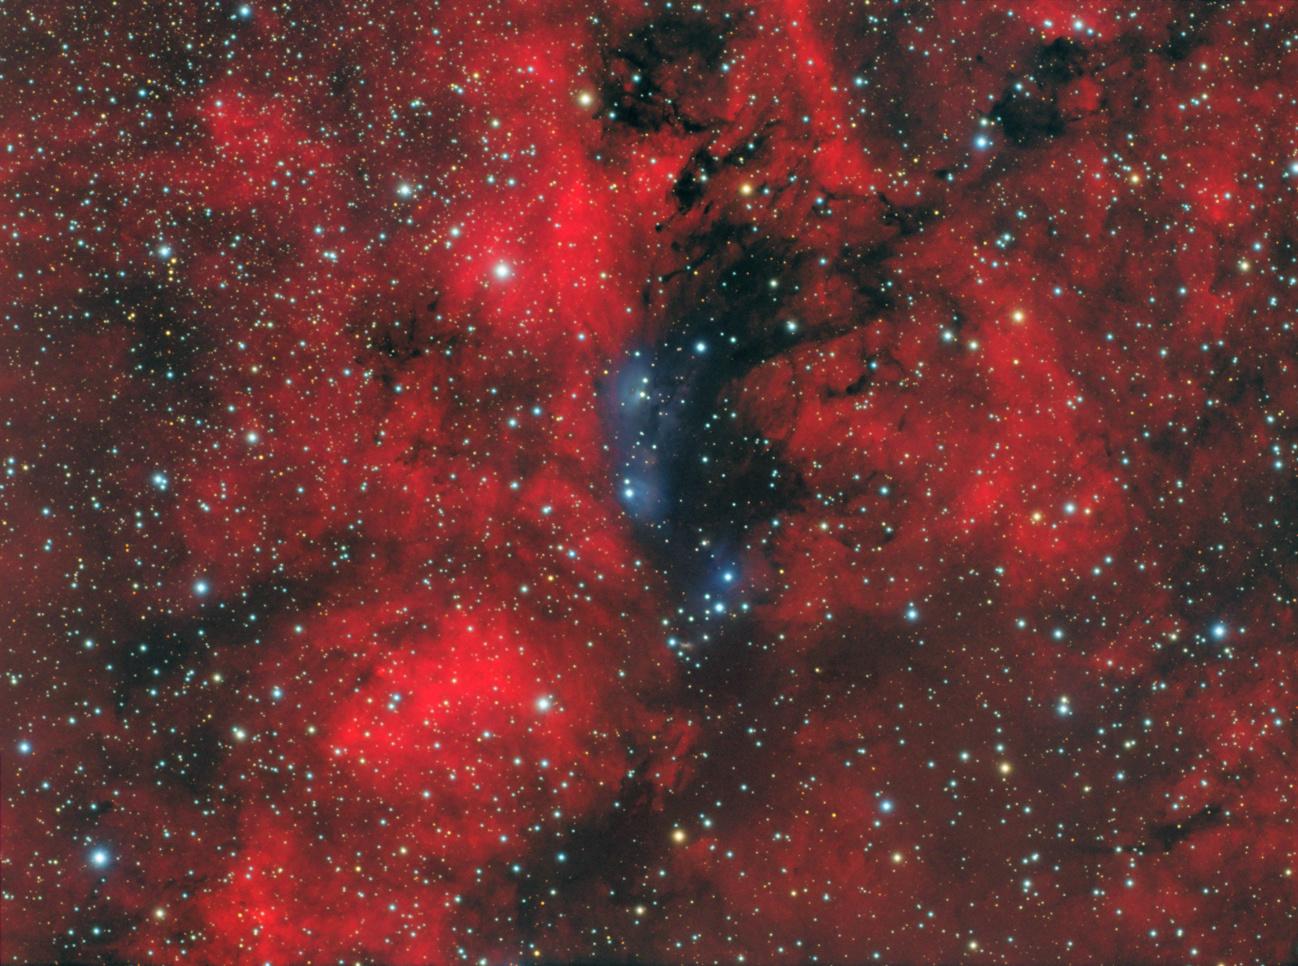 NGC6914_final_v3_sRGB.jpg.a44213e87e1ef0a37fc8fb185fb59c65.jpg